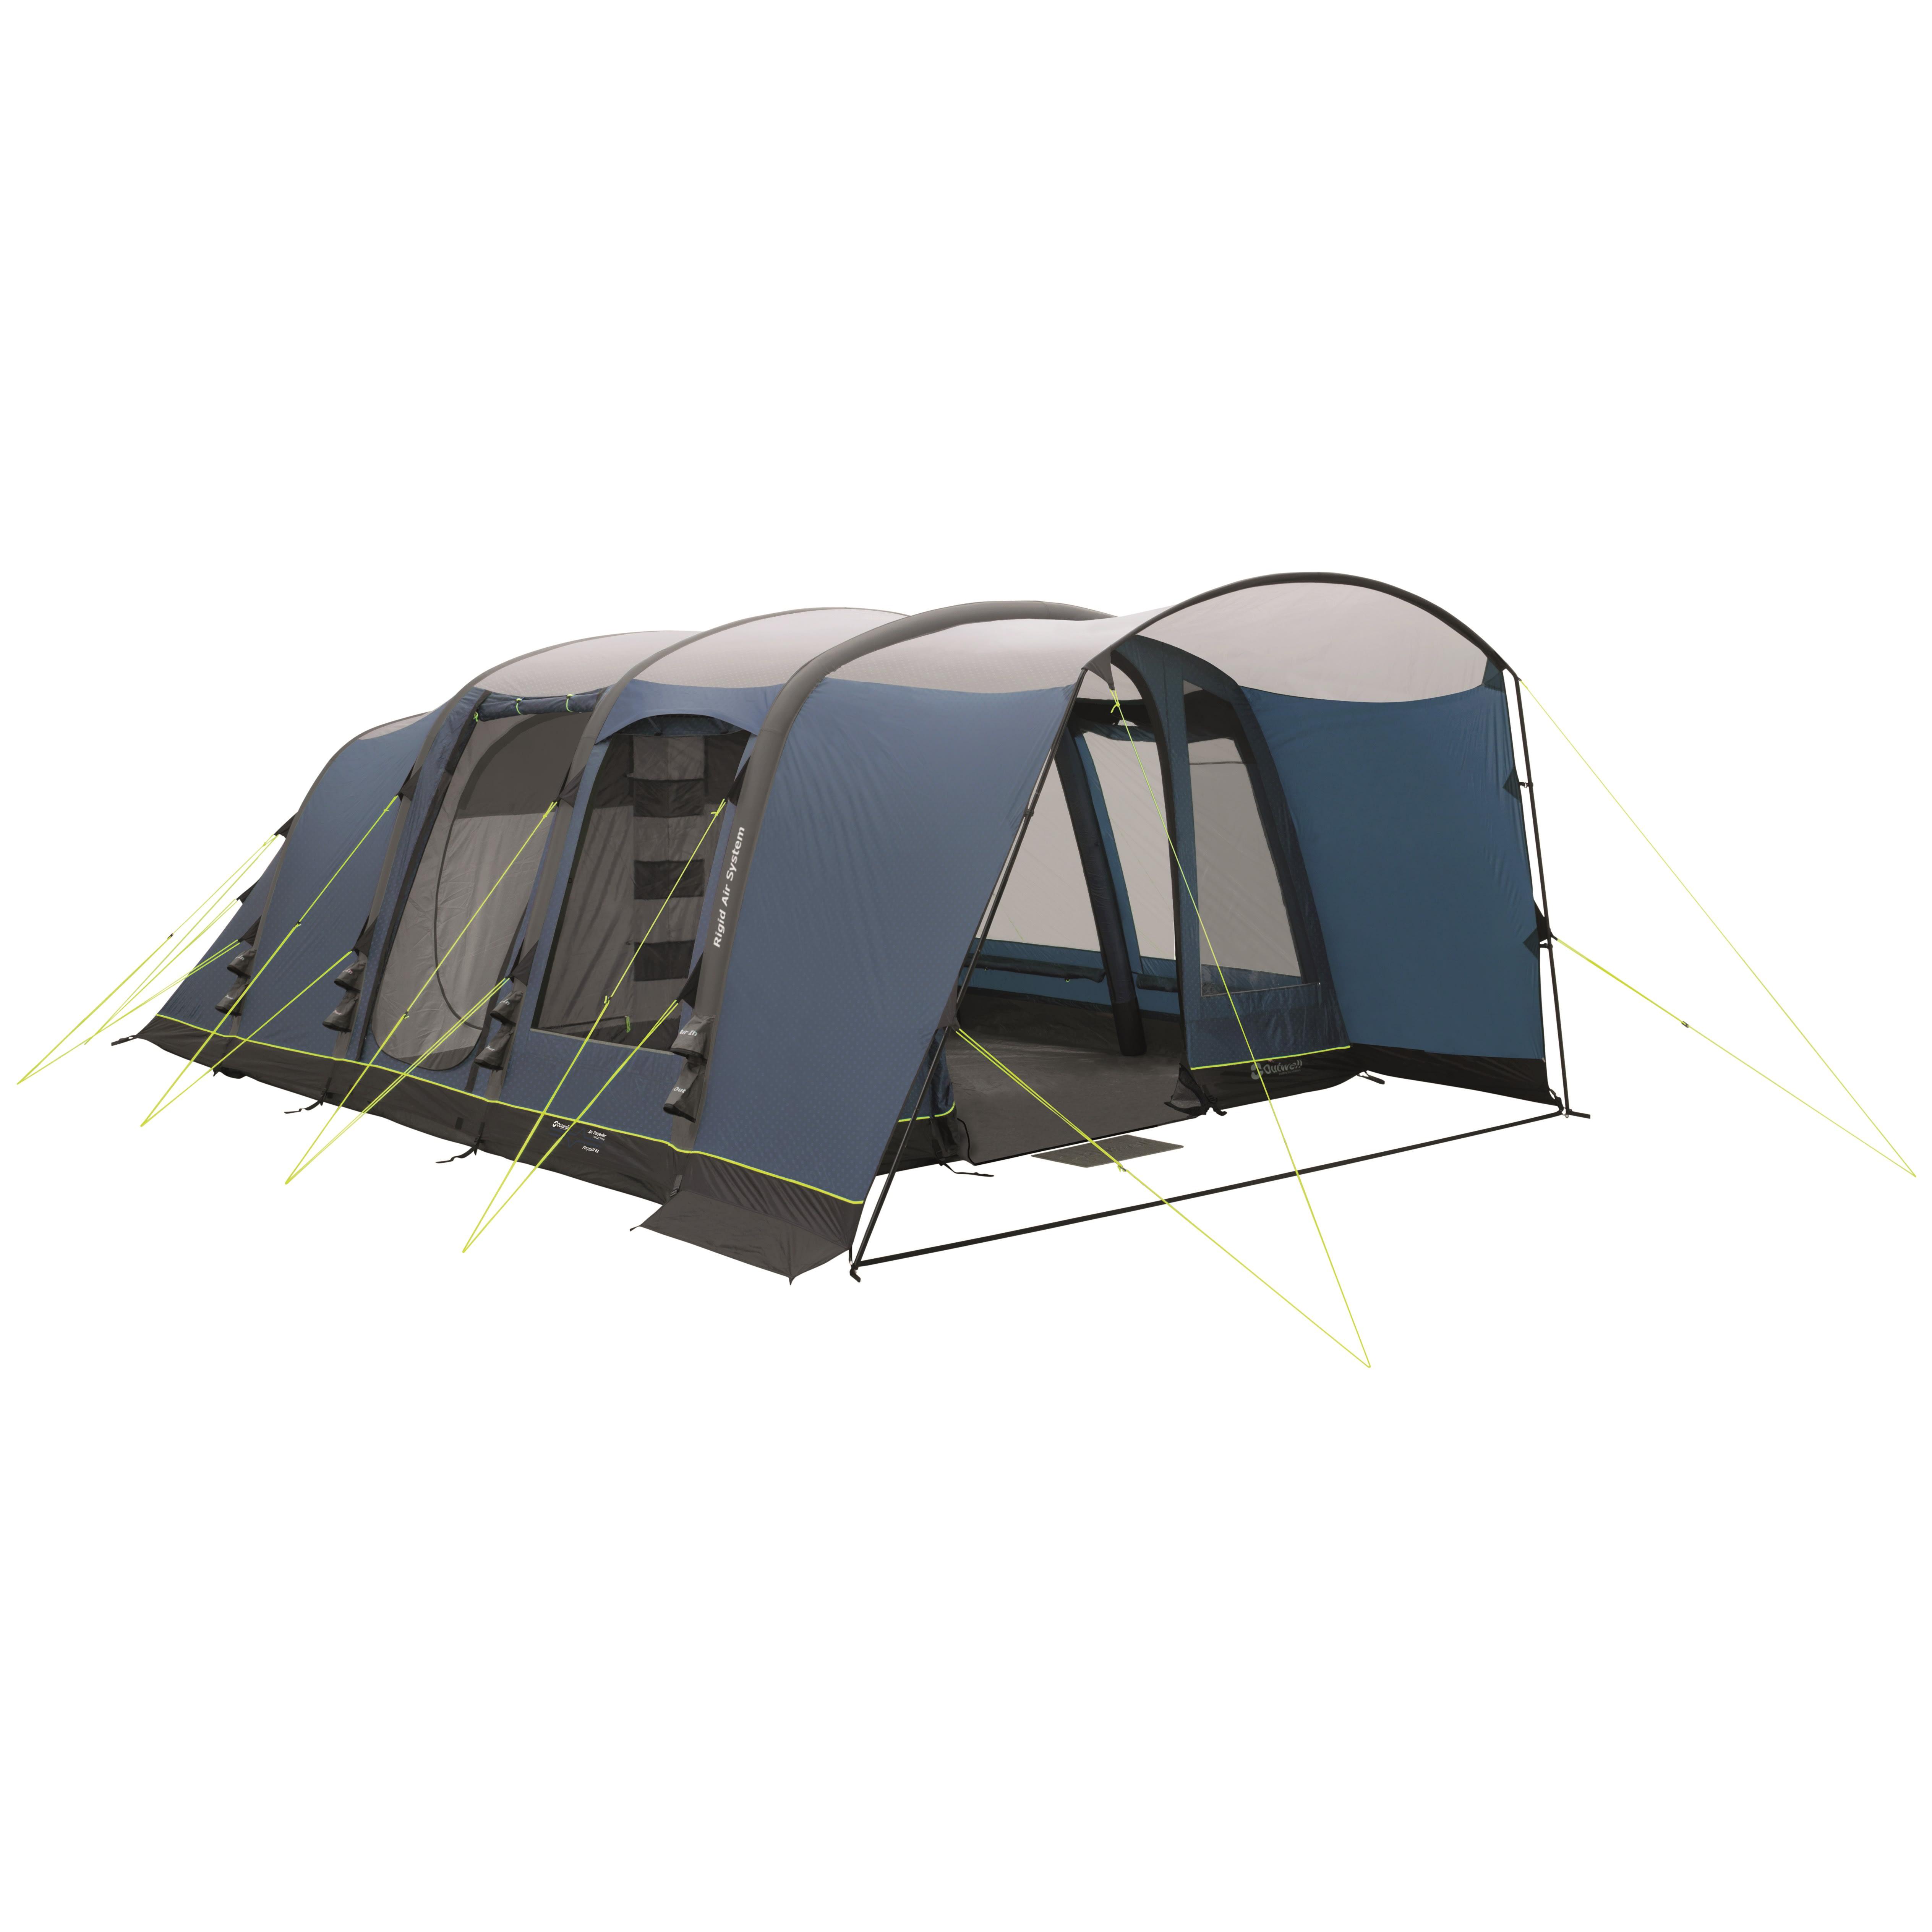 Køb Outwell Flagstaff 6A Telt 6 Personer